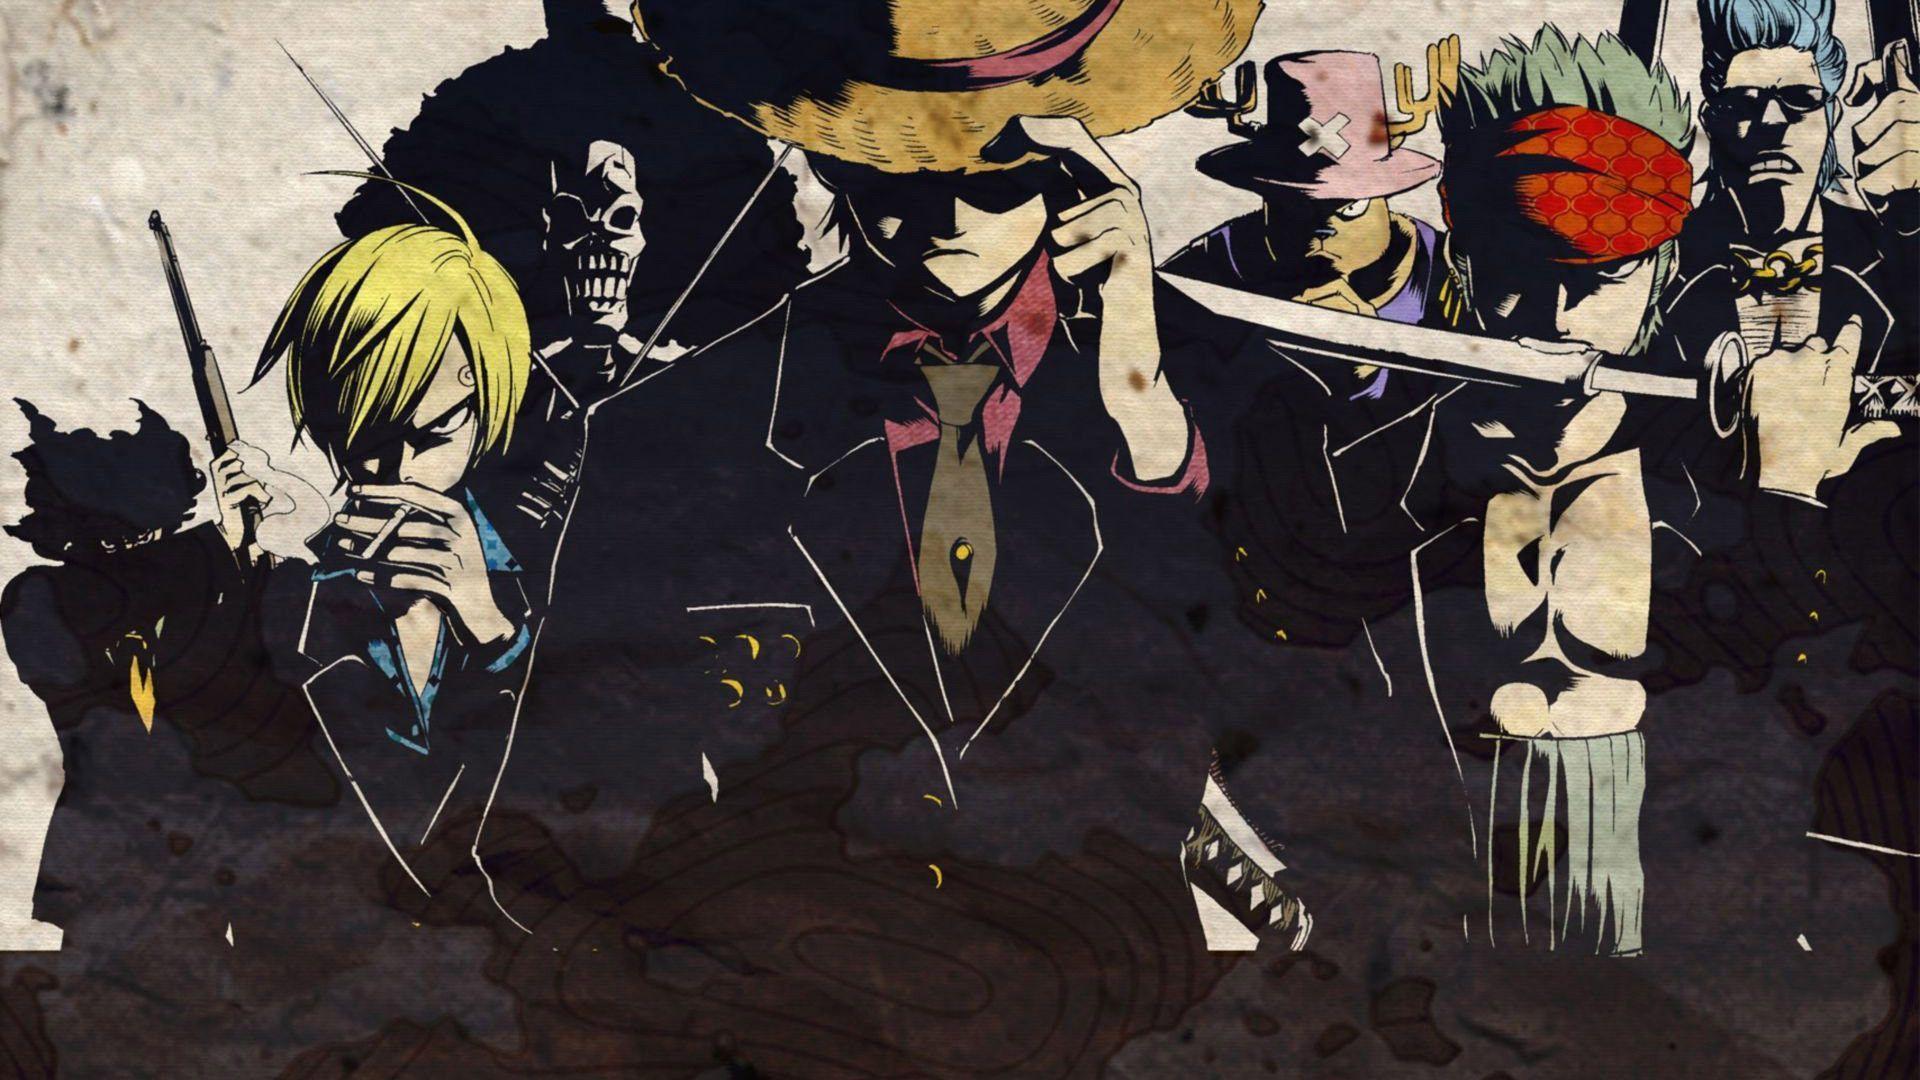 tải ảnh Luffy full hd